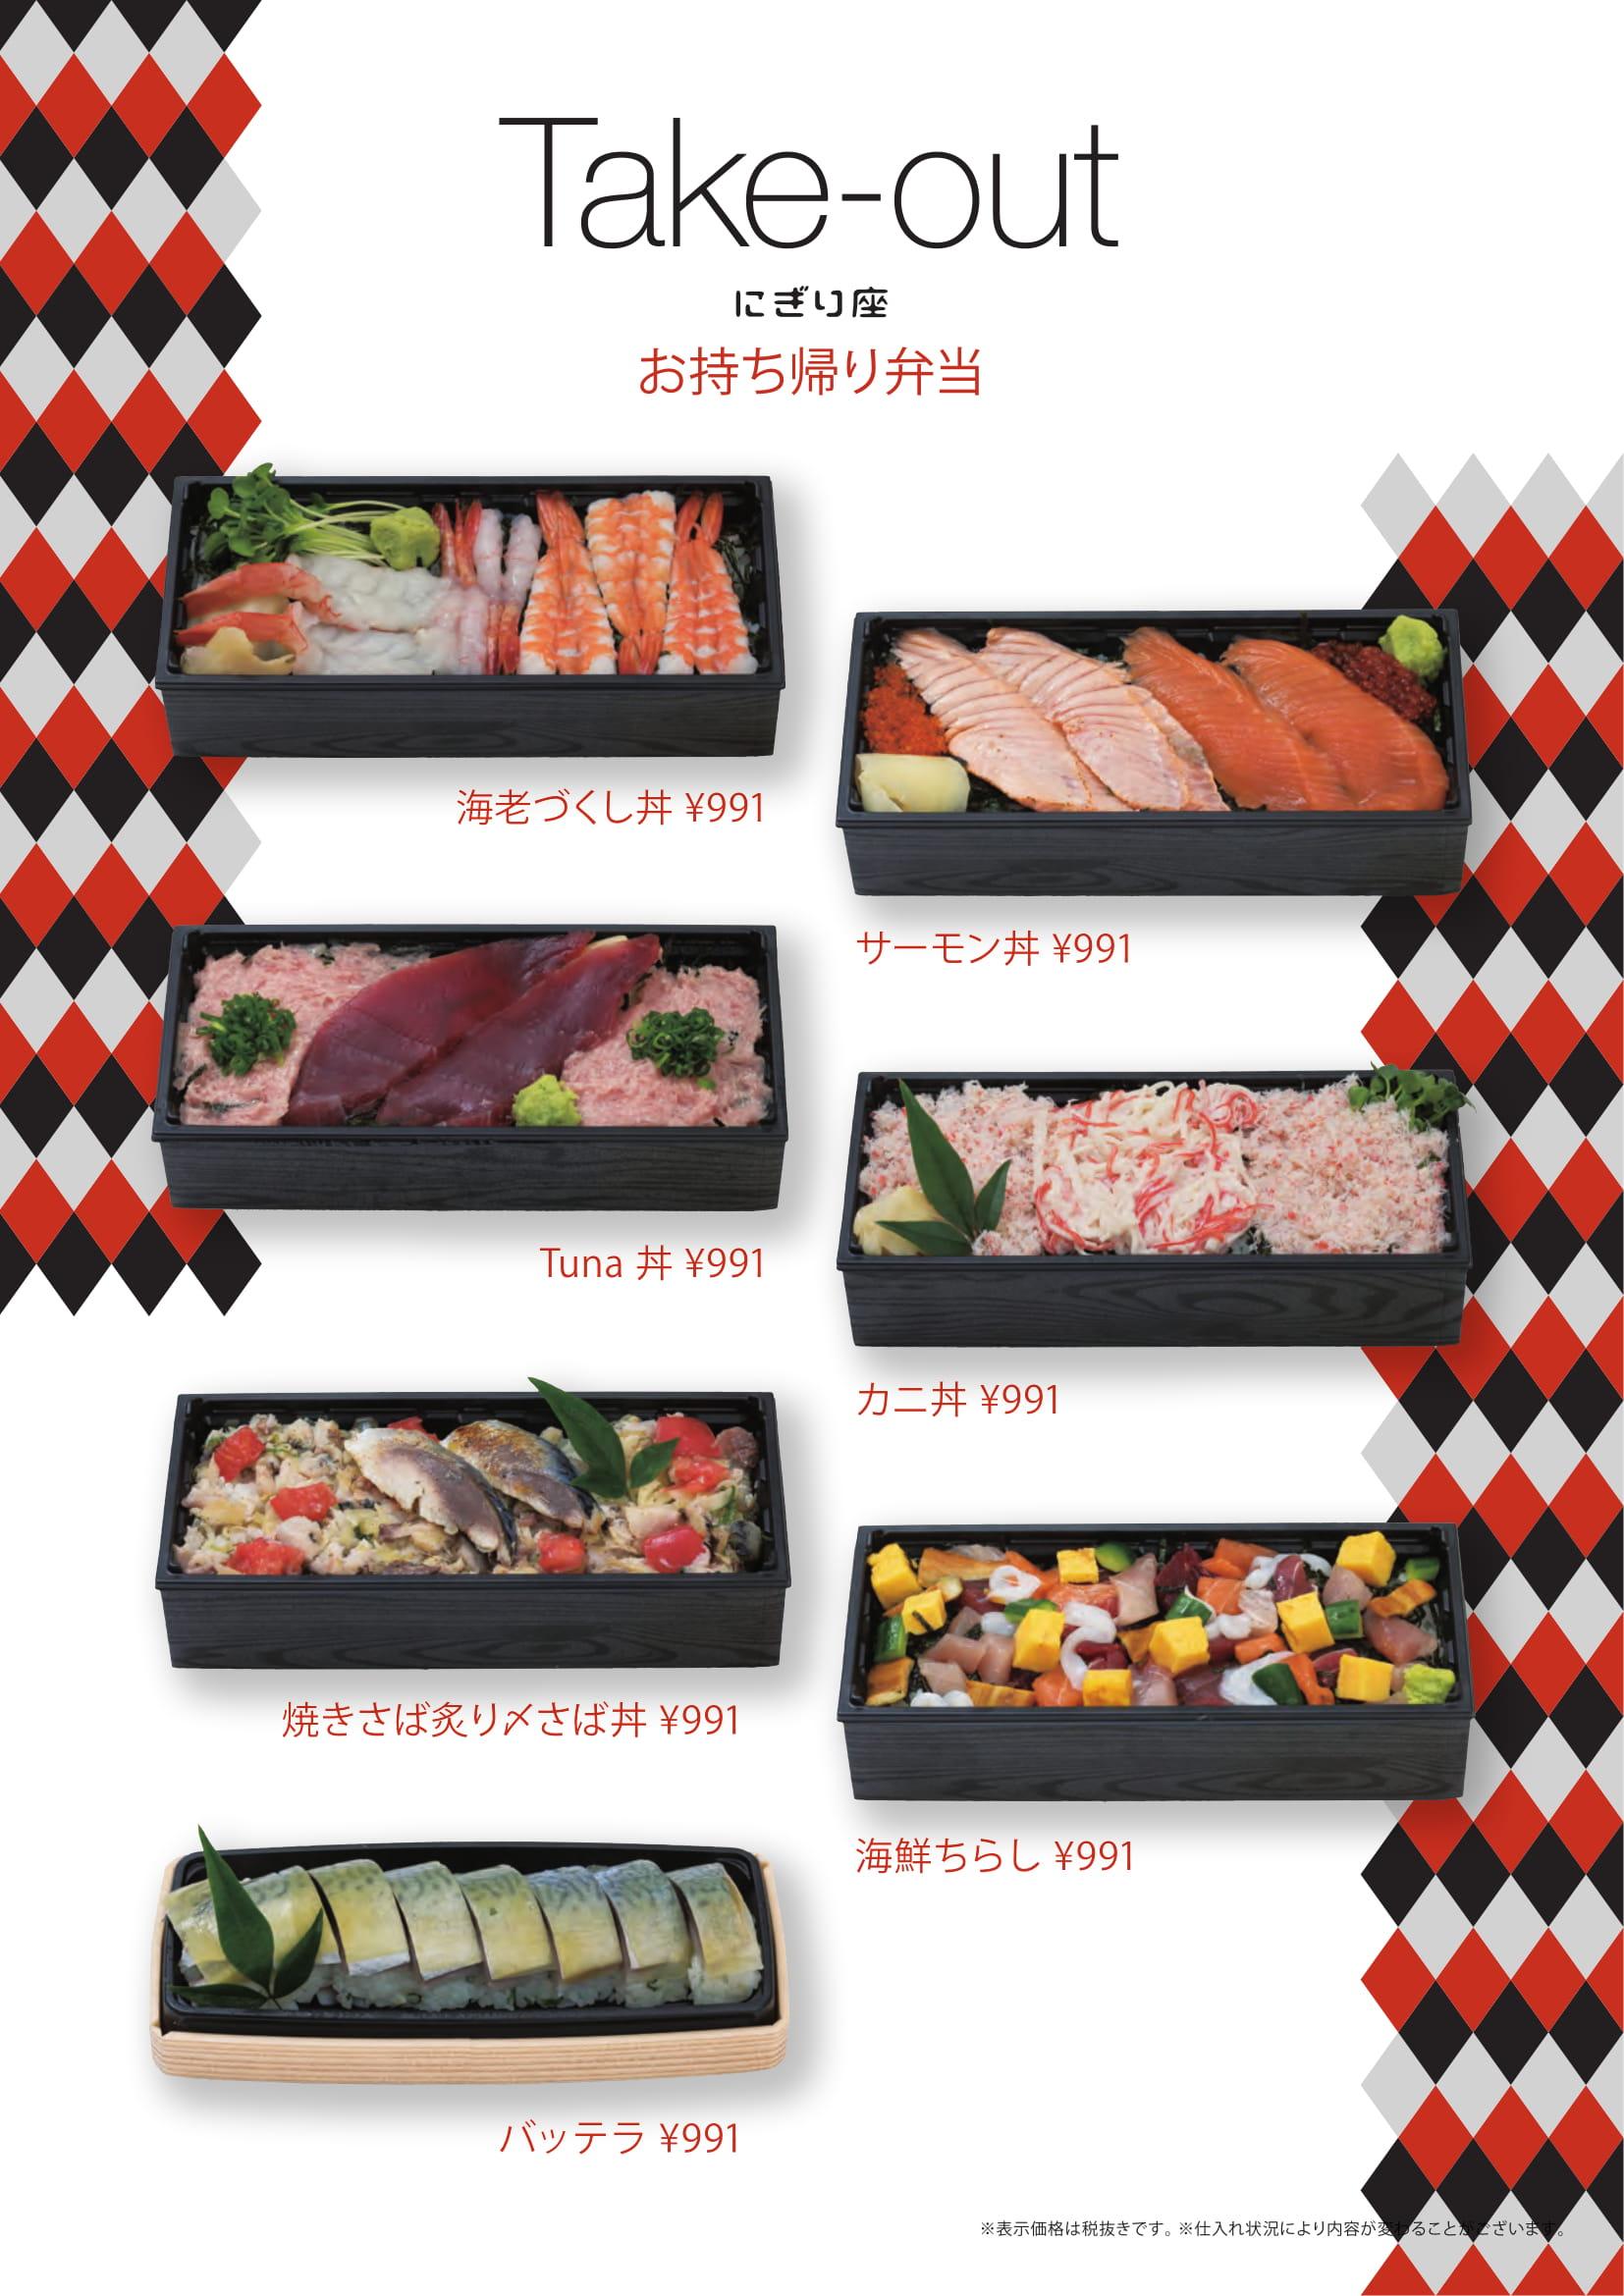 japanese take out menue.jpg